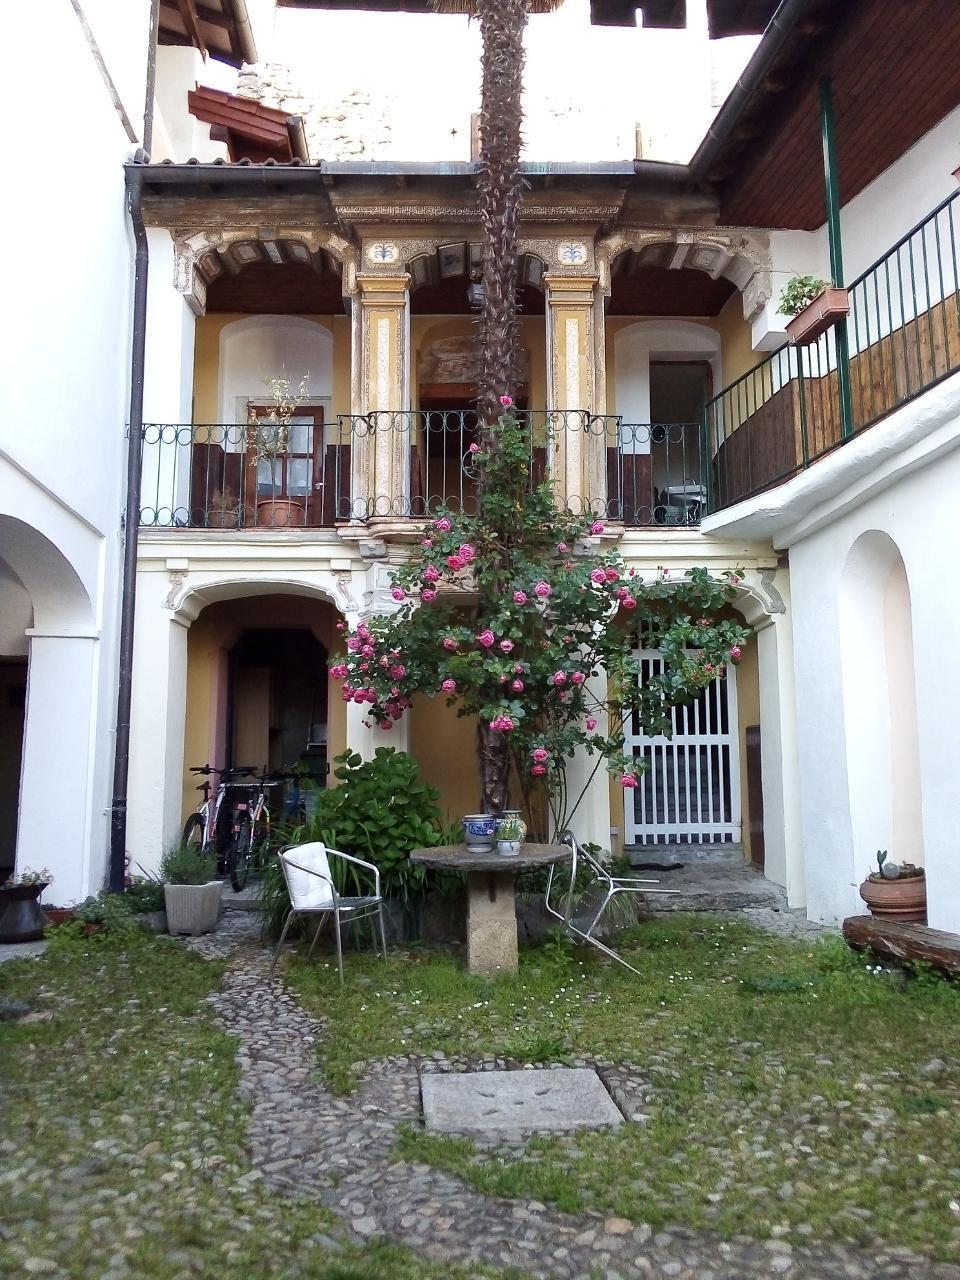 Appartement de vacances Grosszügige Wohnung im historischen Tessinerhaus (2617724), Sessa, Lac de Lugano (CH), Tessin, Suisse, image 9